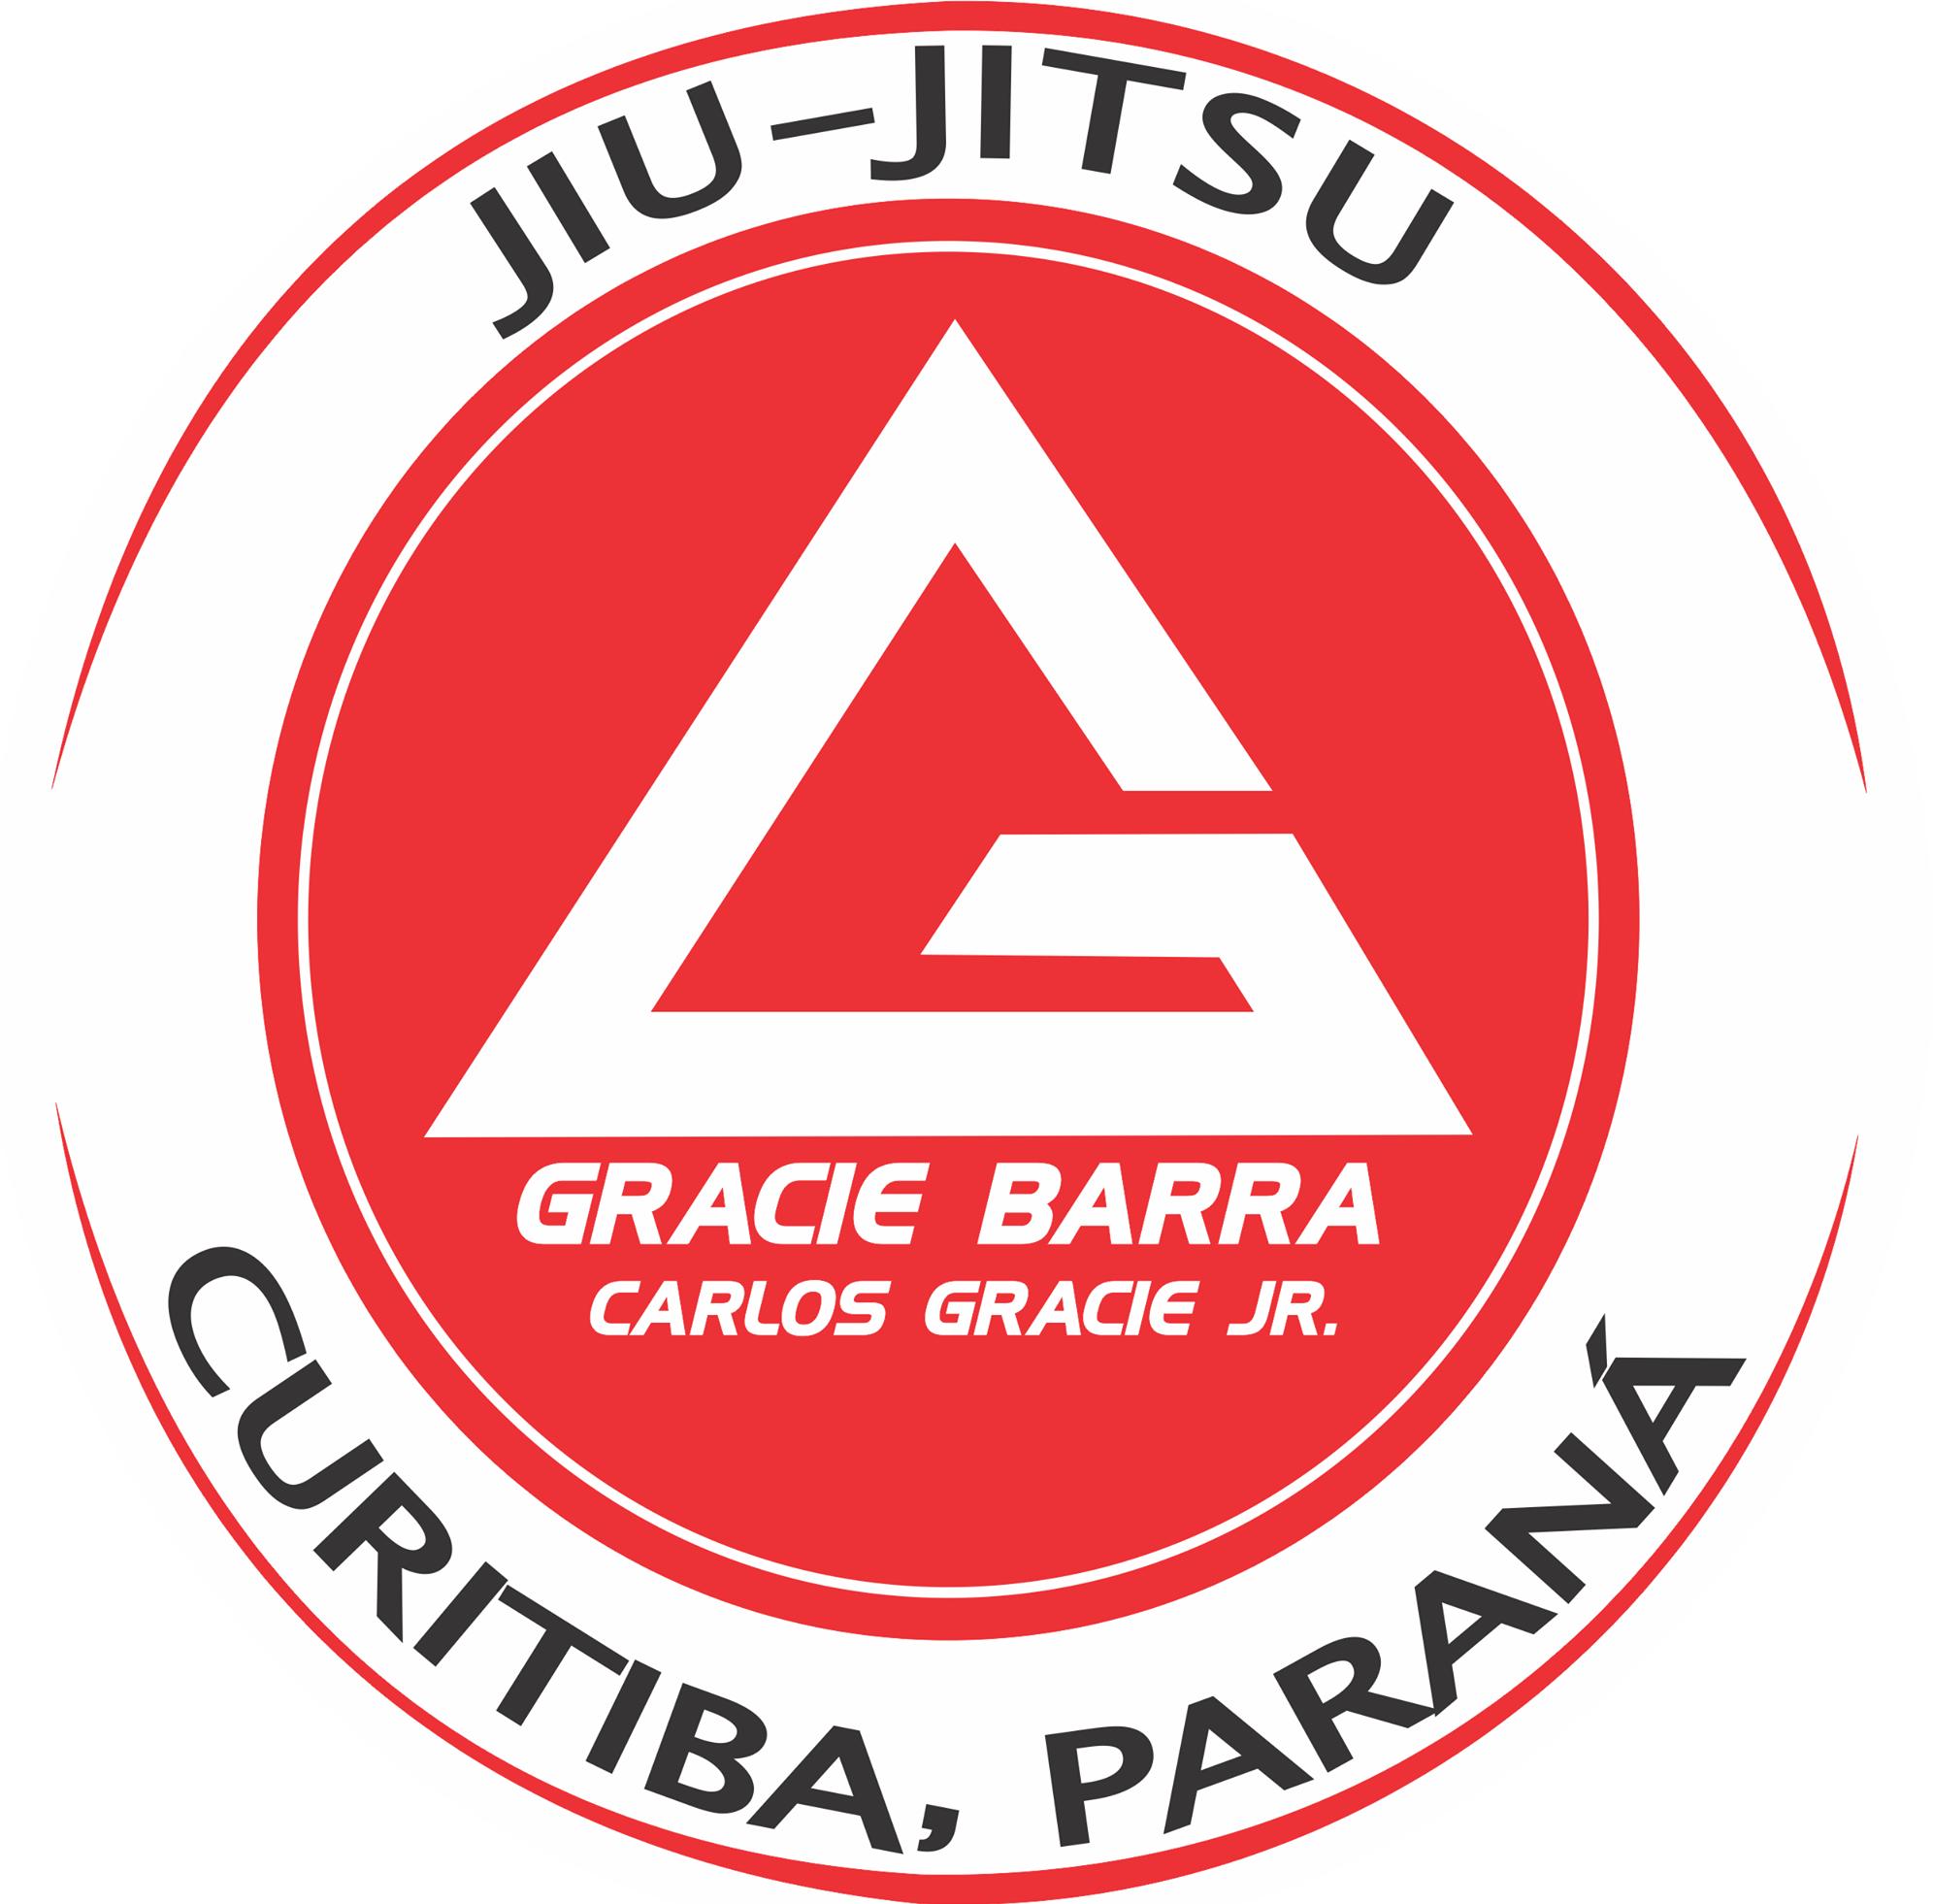 GB Curitiba